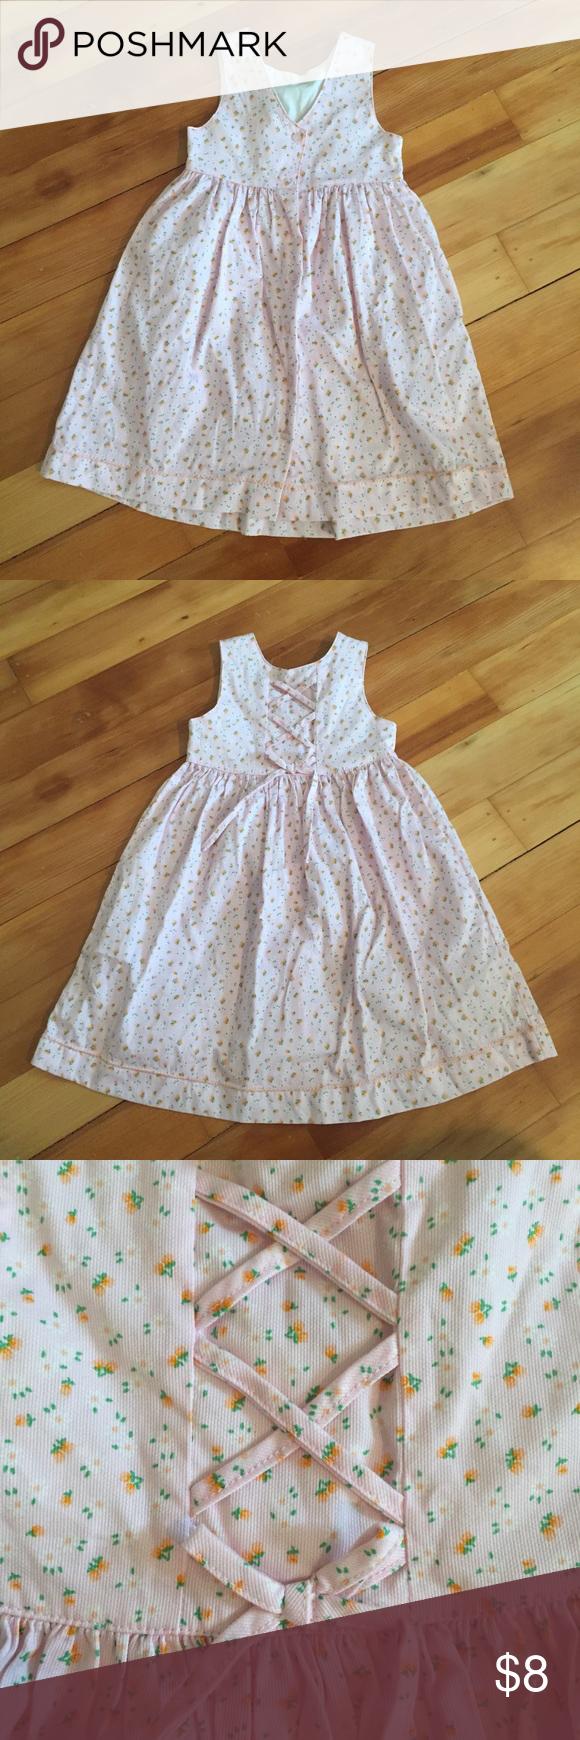 Laura Ashley dress Cute girl dresses, Laura ashley dress